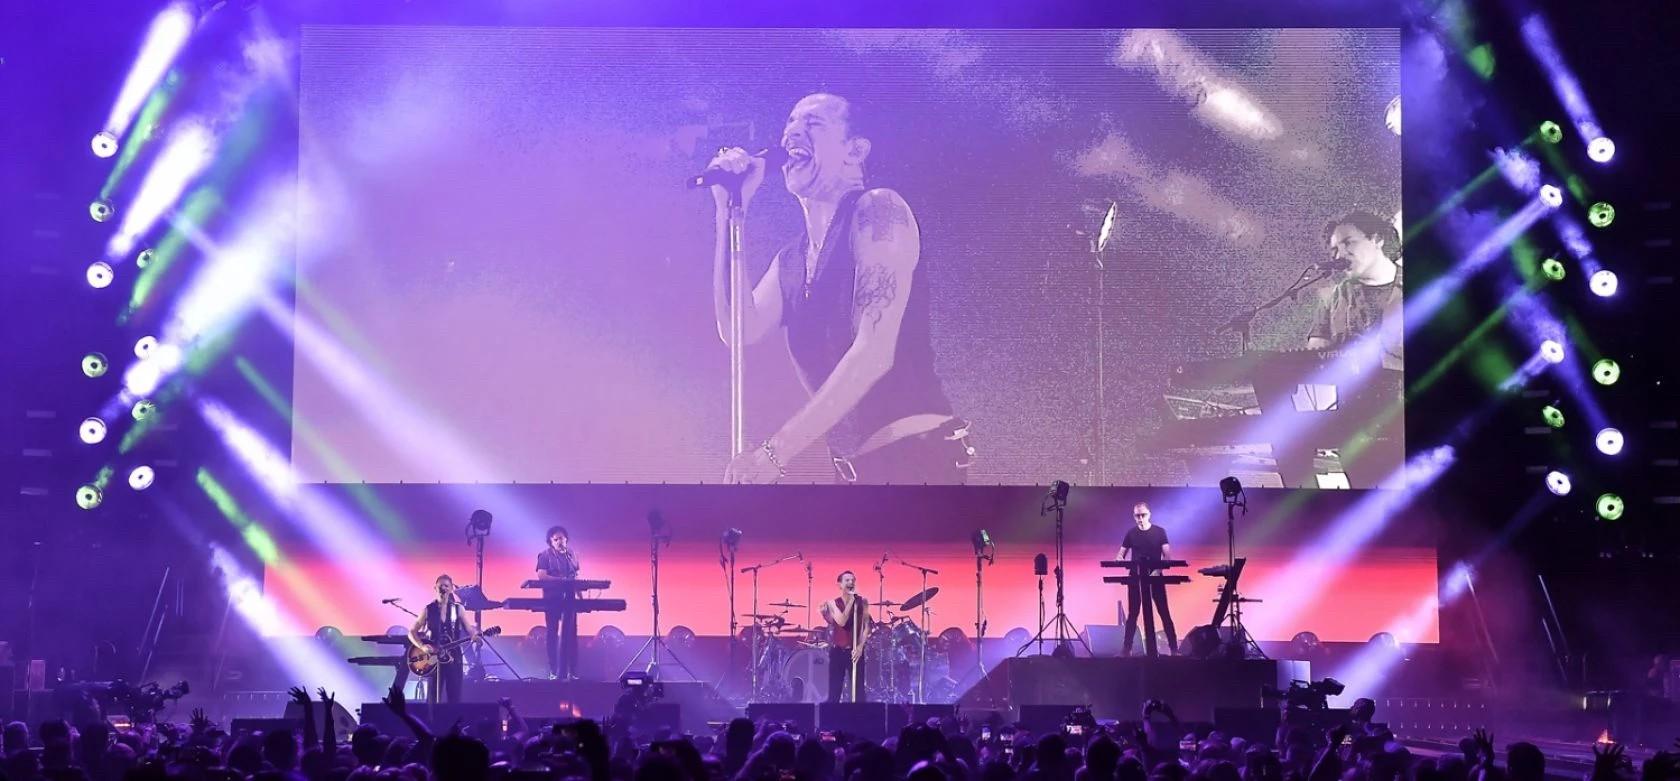 WA76 用于 Depeche Mode Tour 2017-2018